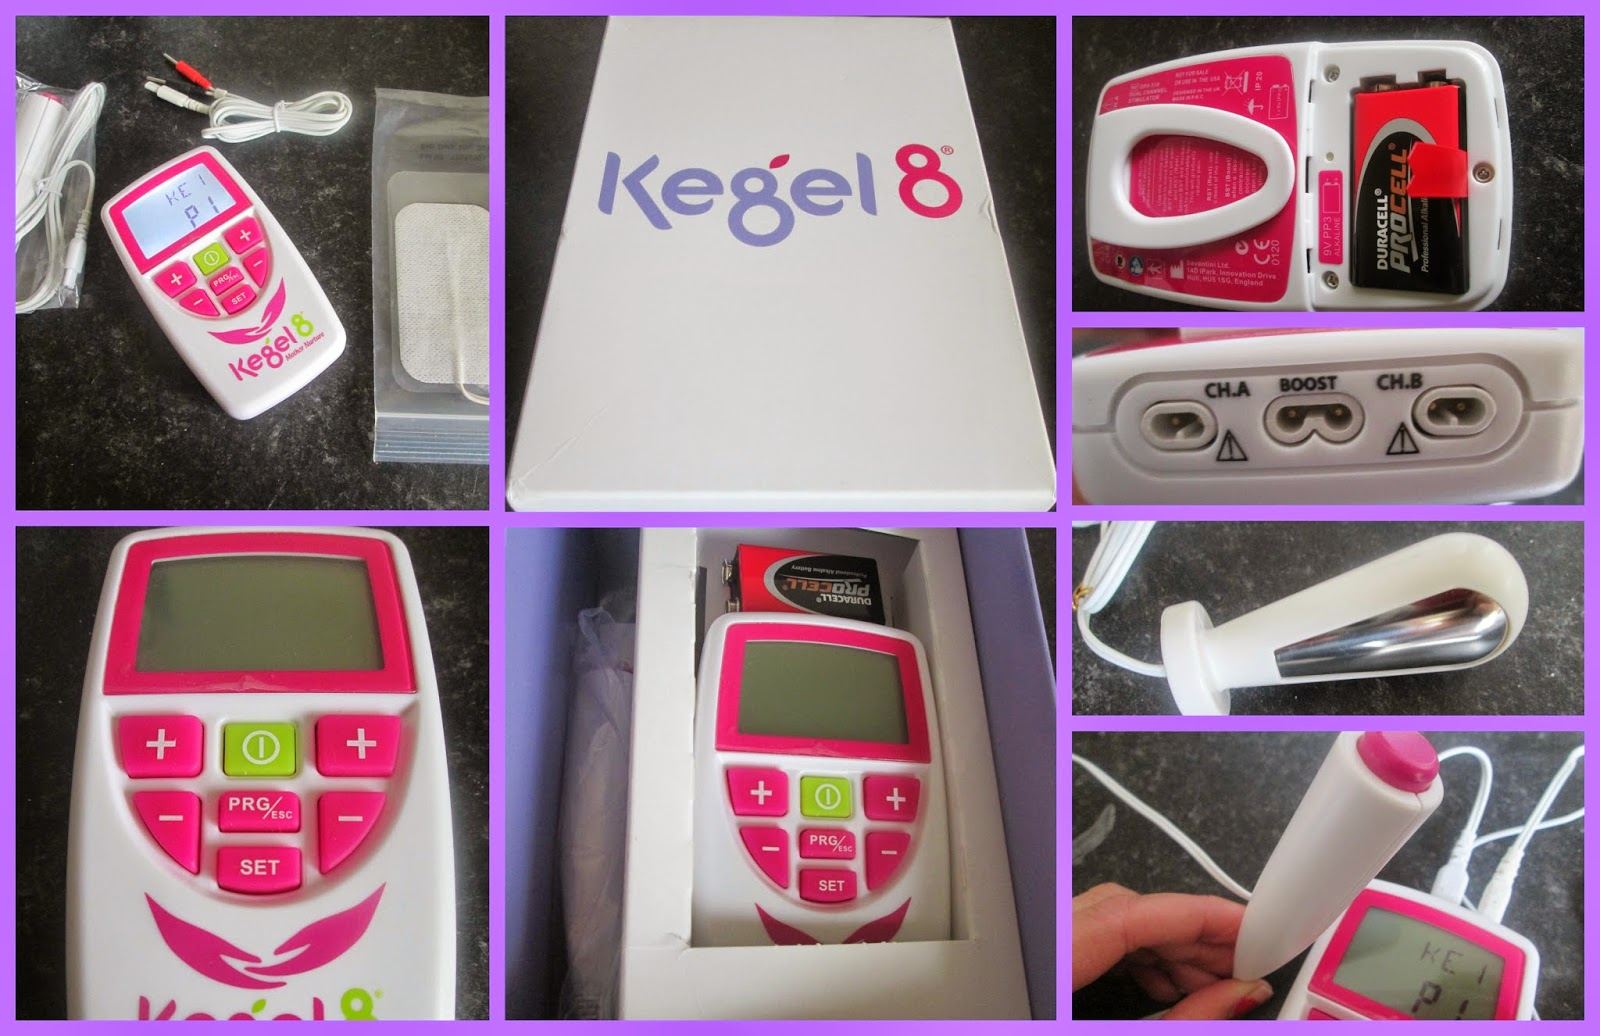 Kegel8 Mother Nurture Electronic Pelvic Toner Tens Review My